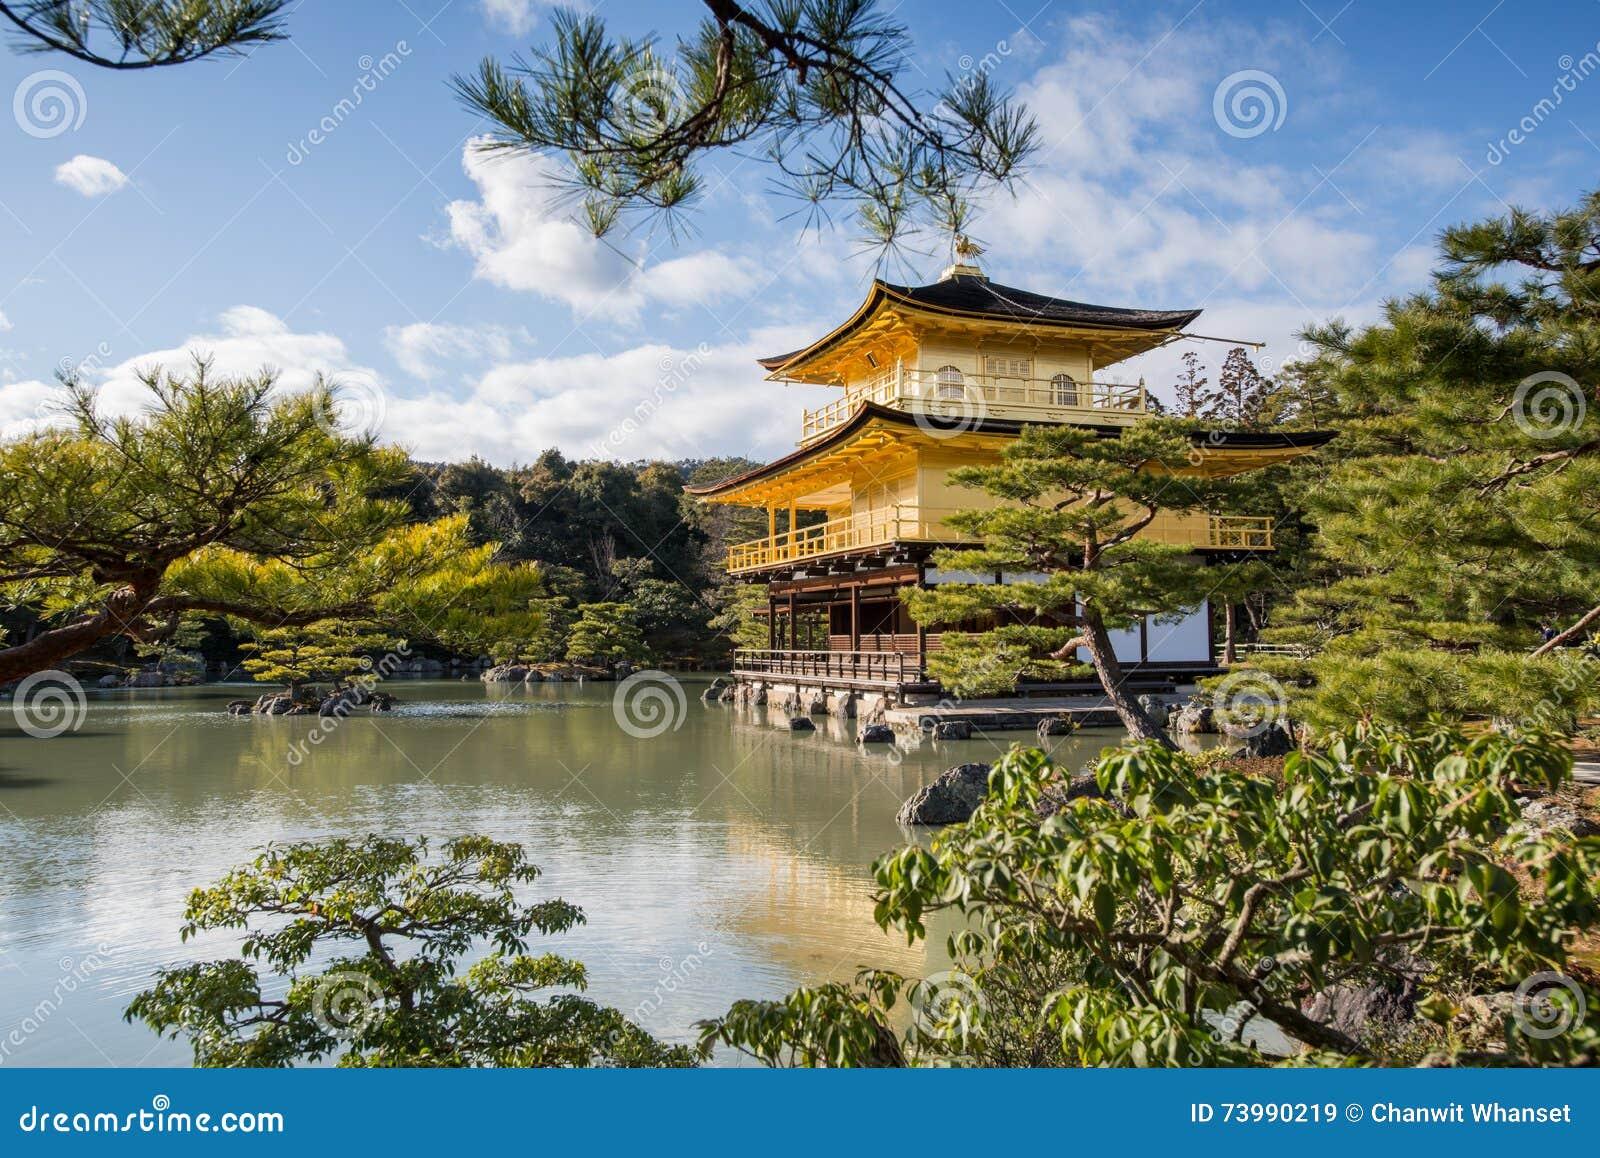 Kinkaku -kinkaku-ji, het Gouden Paviljoen, een Zen Buddhist-tempel in Kyoto,